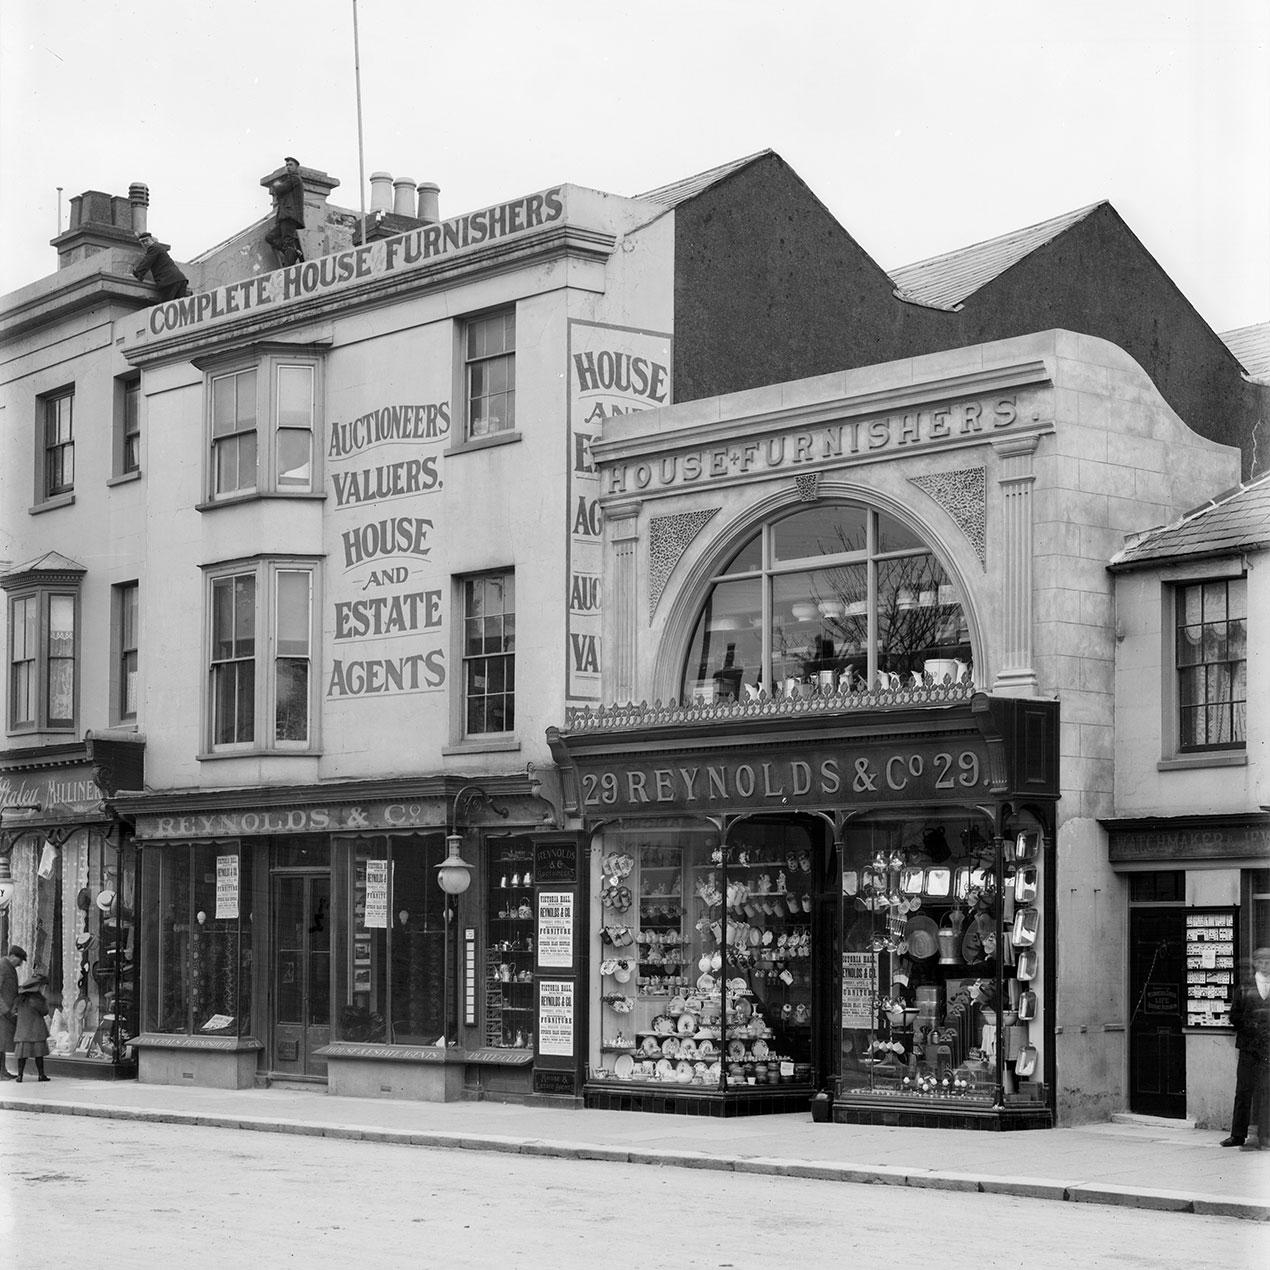 Photograph of the original Reynolds storefront in Bognor Regis